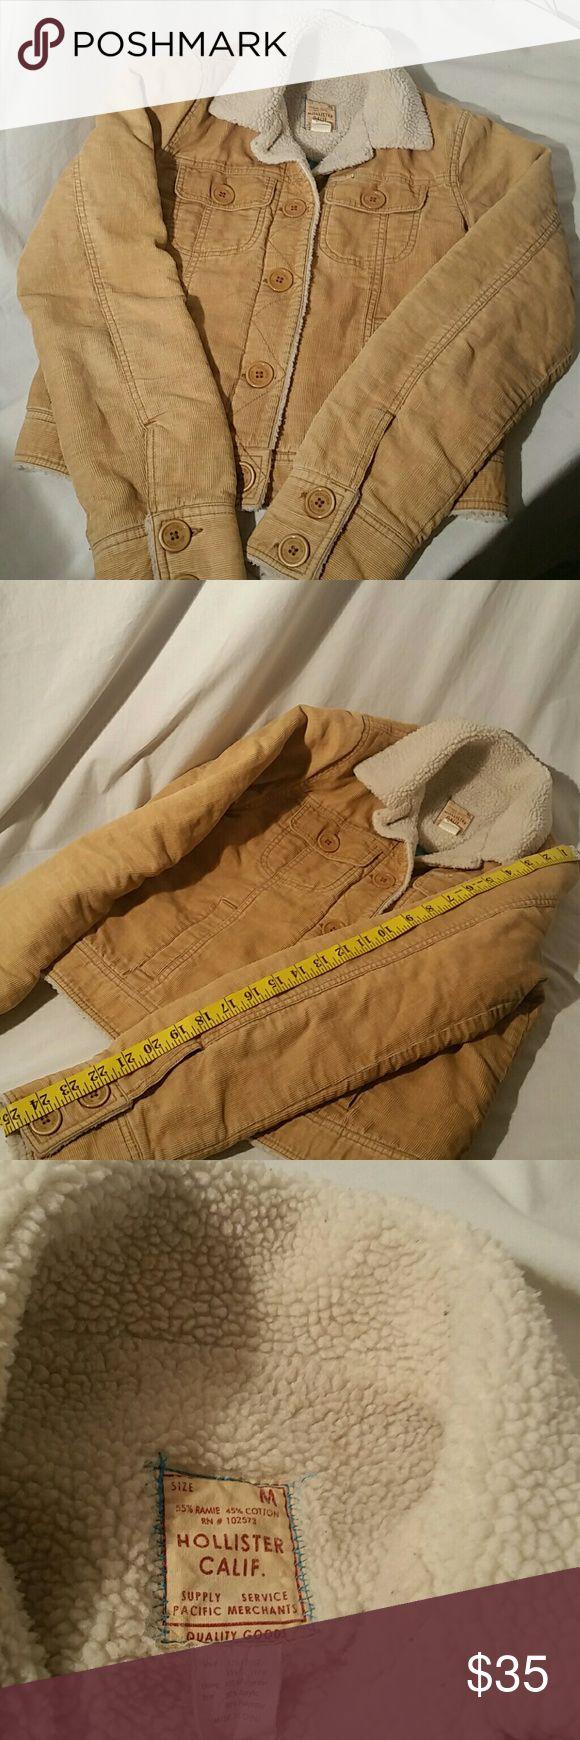 Hollister Jacket Hollister Jacket, size medium. Made of 55% Ramie  and 45% Cotton. Great Fall Jacket. Hollister Jackets & Coats